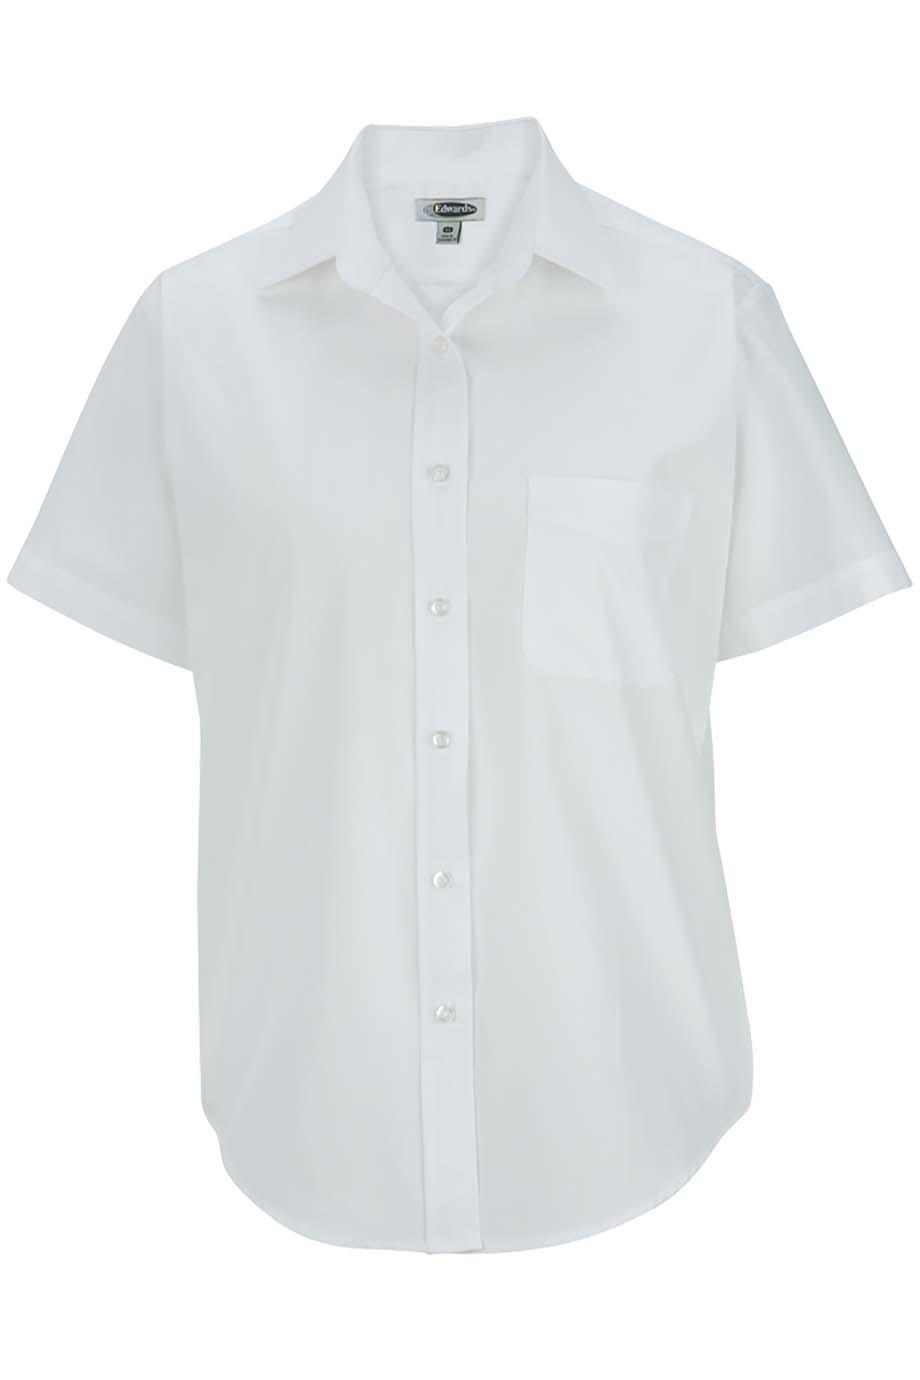 Women's Short Sleeve Value Broadcloth Shirt5313